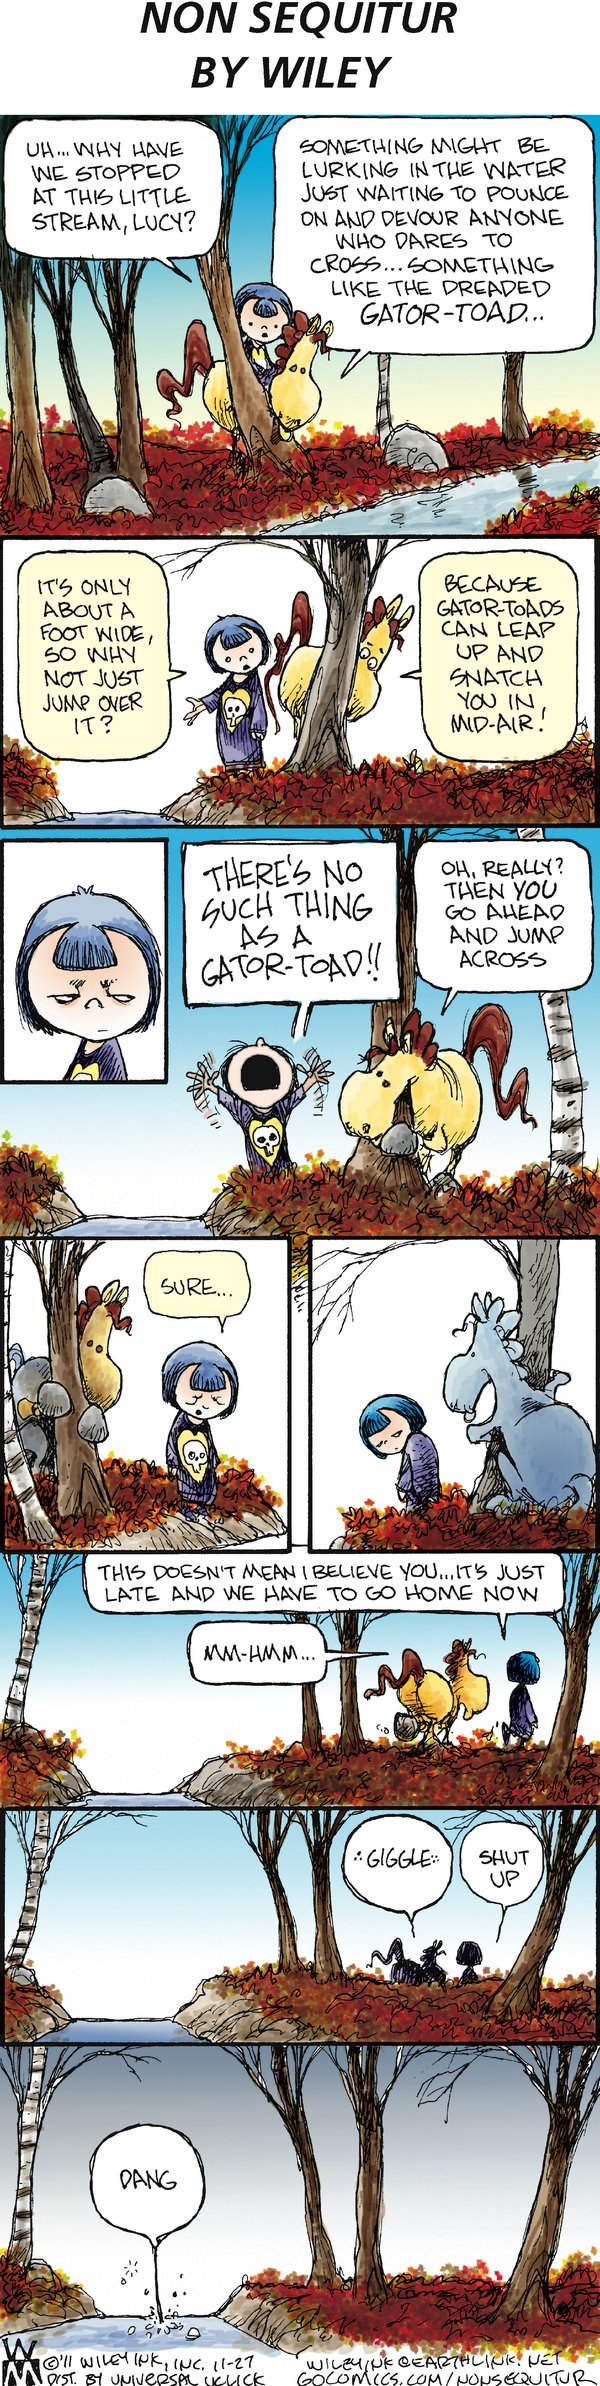 Non Sequitur Comic Strip for November 27, 2011